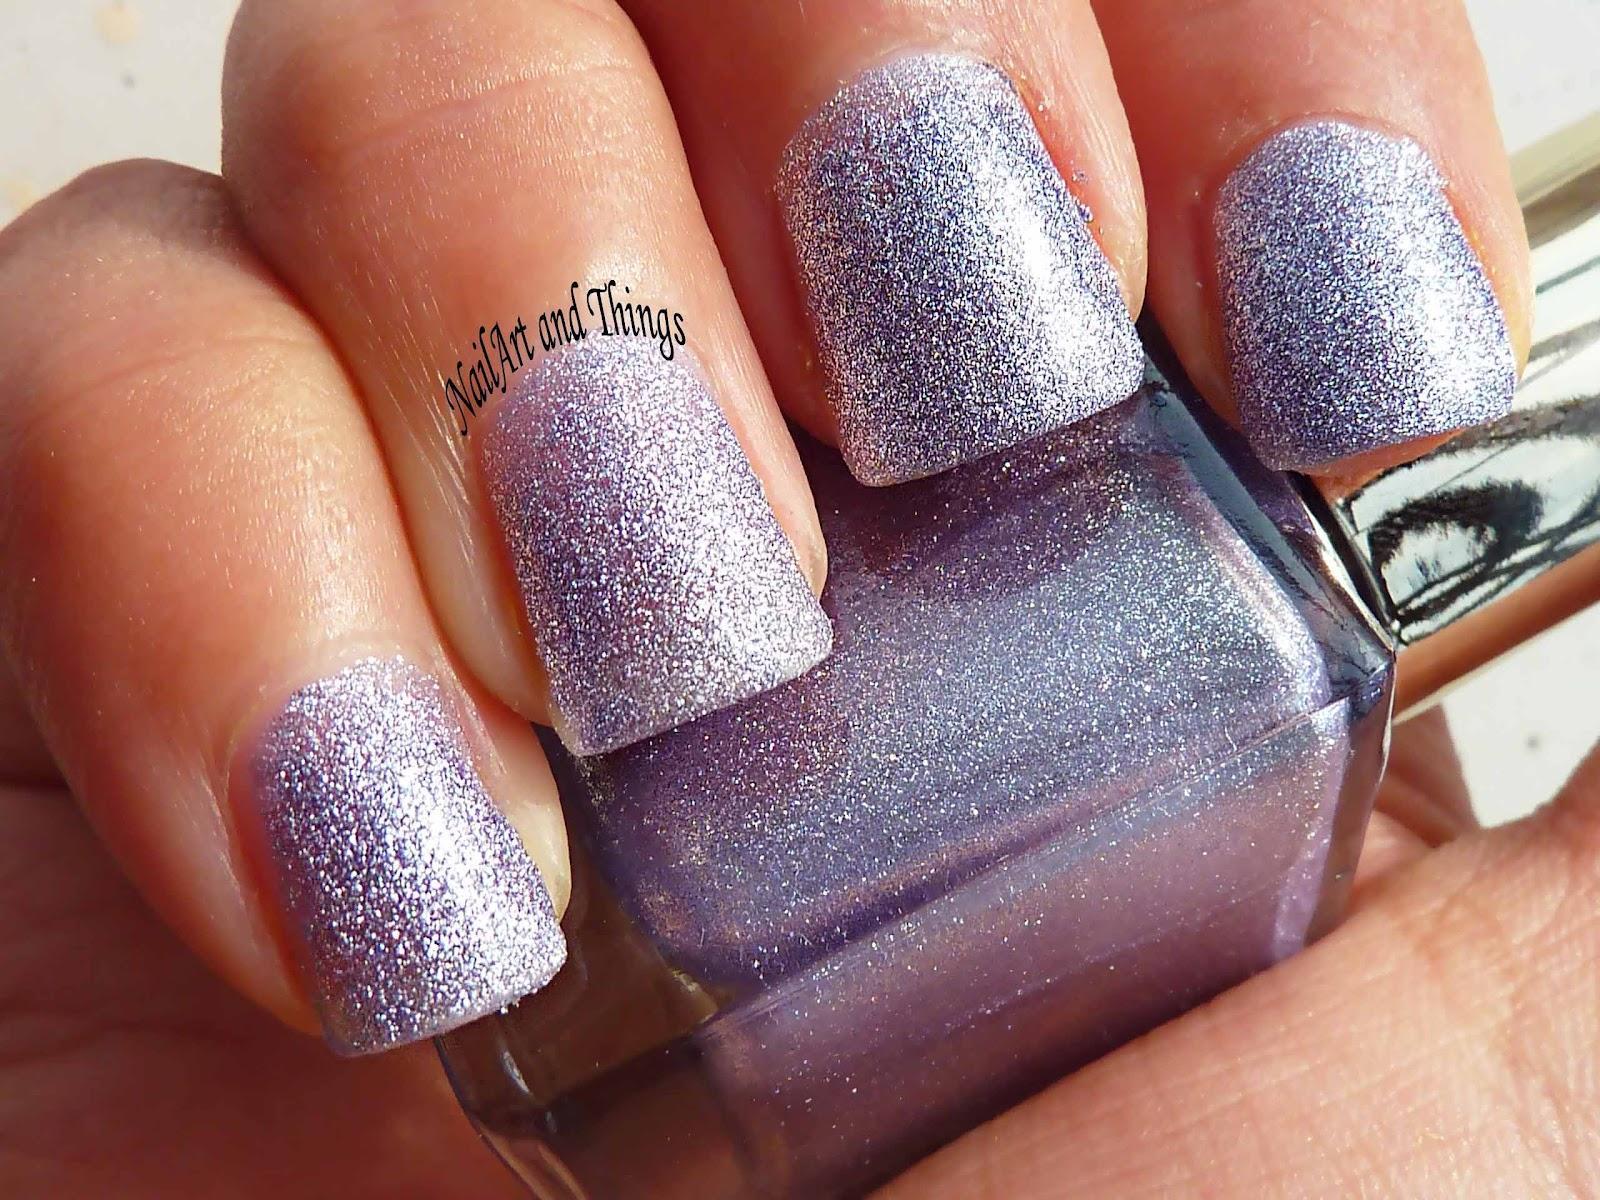 NailArt and Things: Sandy Matt Purple + Rhinestones Nail Art